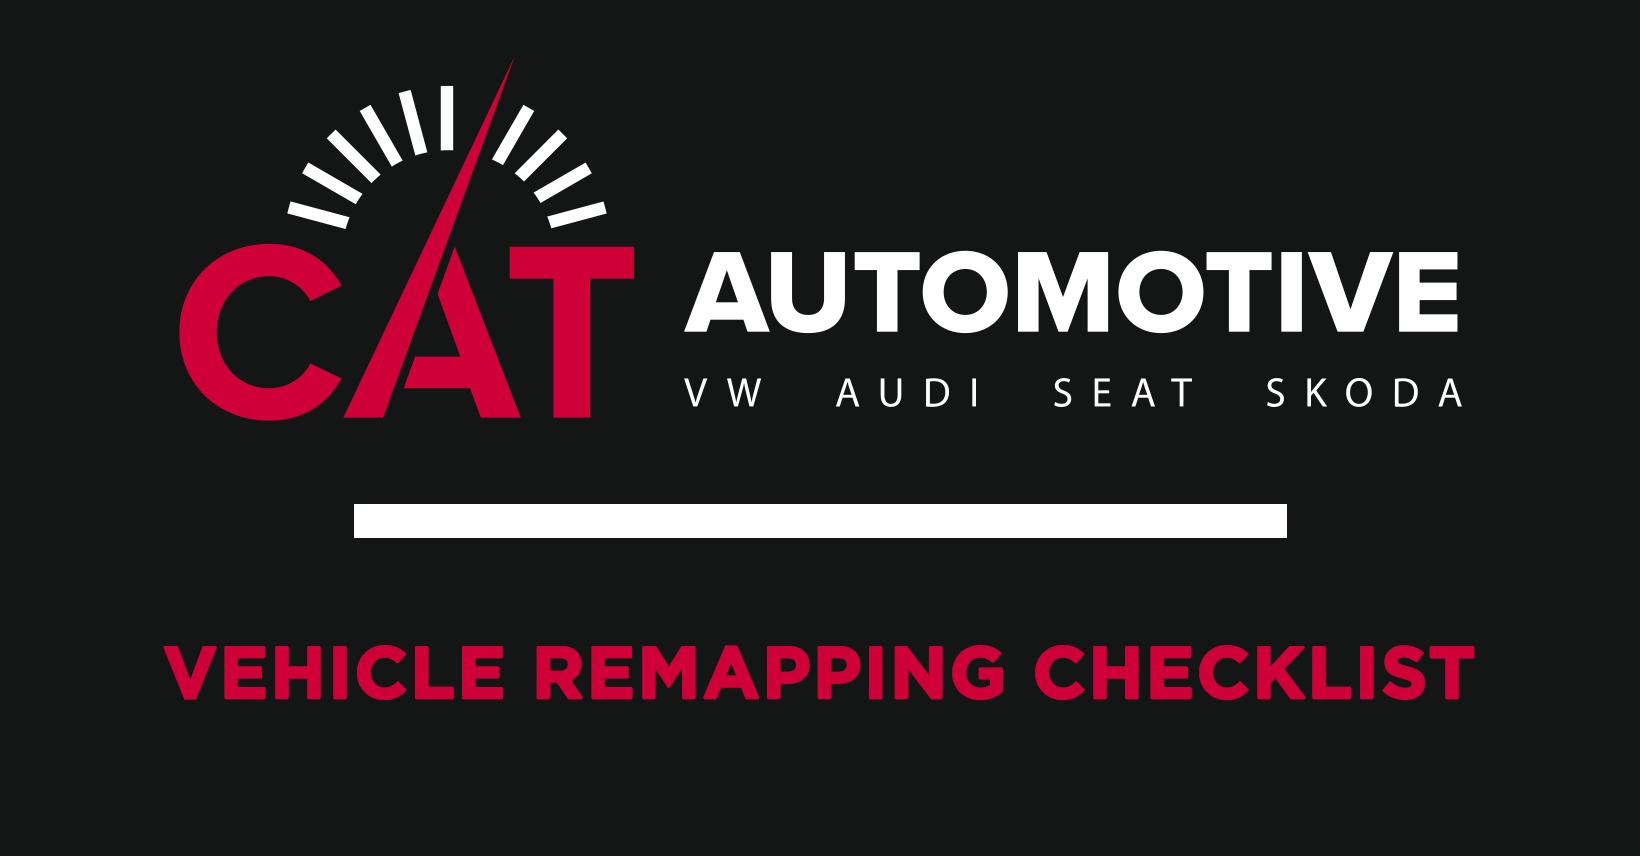 Vehicle Remapping Checklist